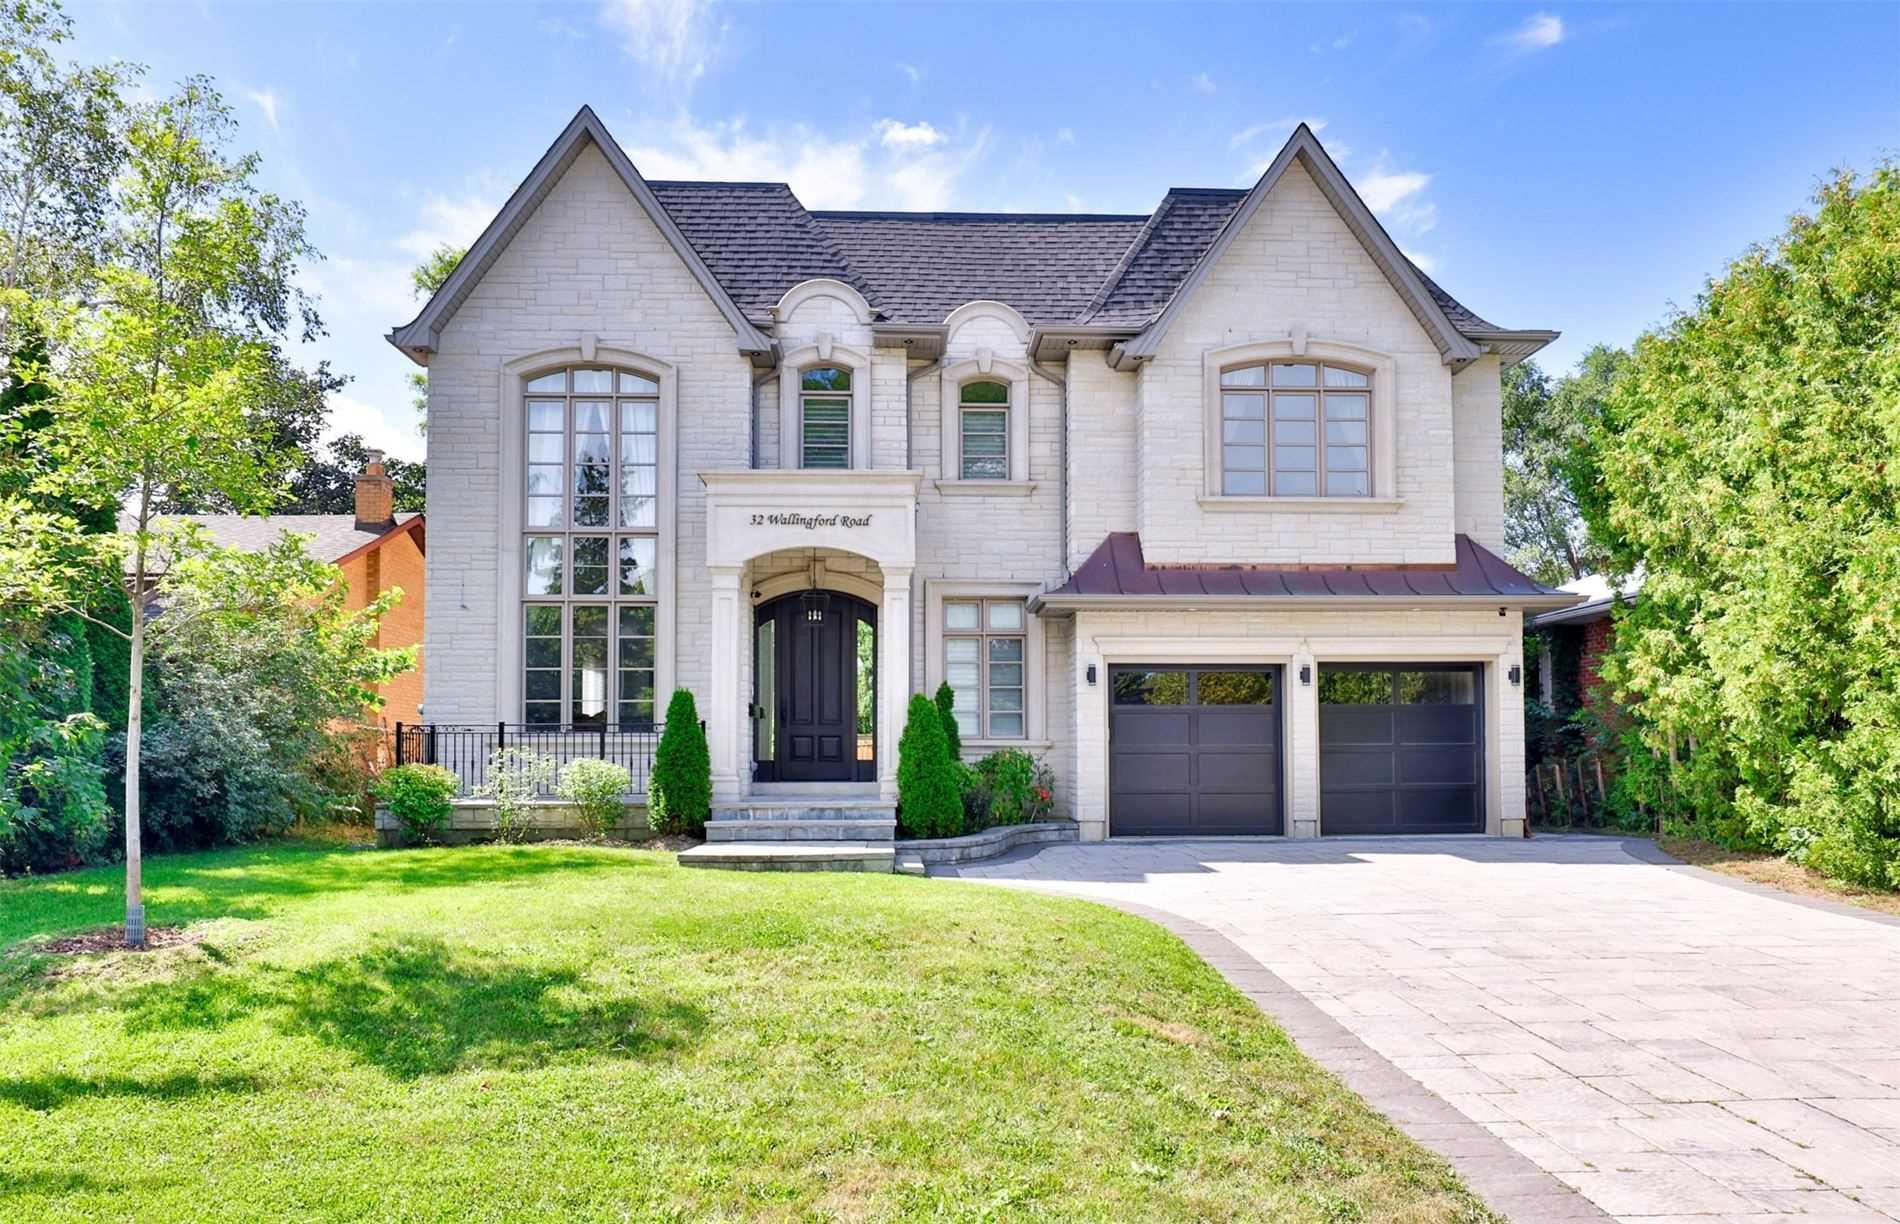 32 Wallingford Rd, Toronto, Ontario M3A2T9, 4 Bedrooms Bedrooms, 10 Rooms Rooms,7 BathroomsBathrooms,Detached,For Sale,Wallingford,C5362302